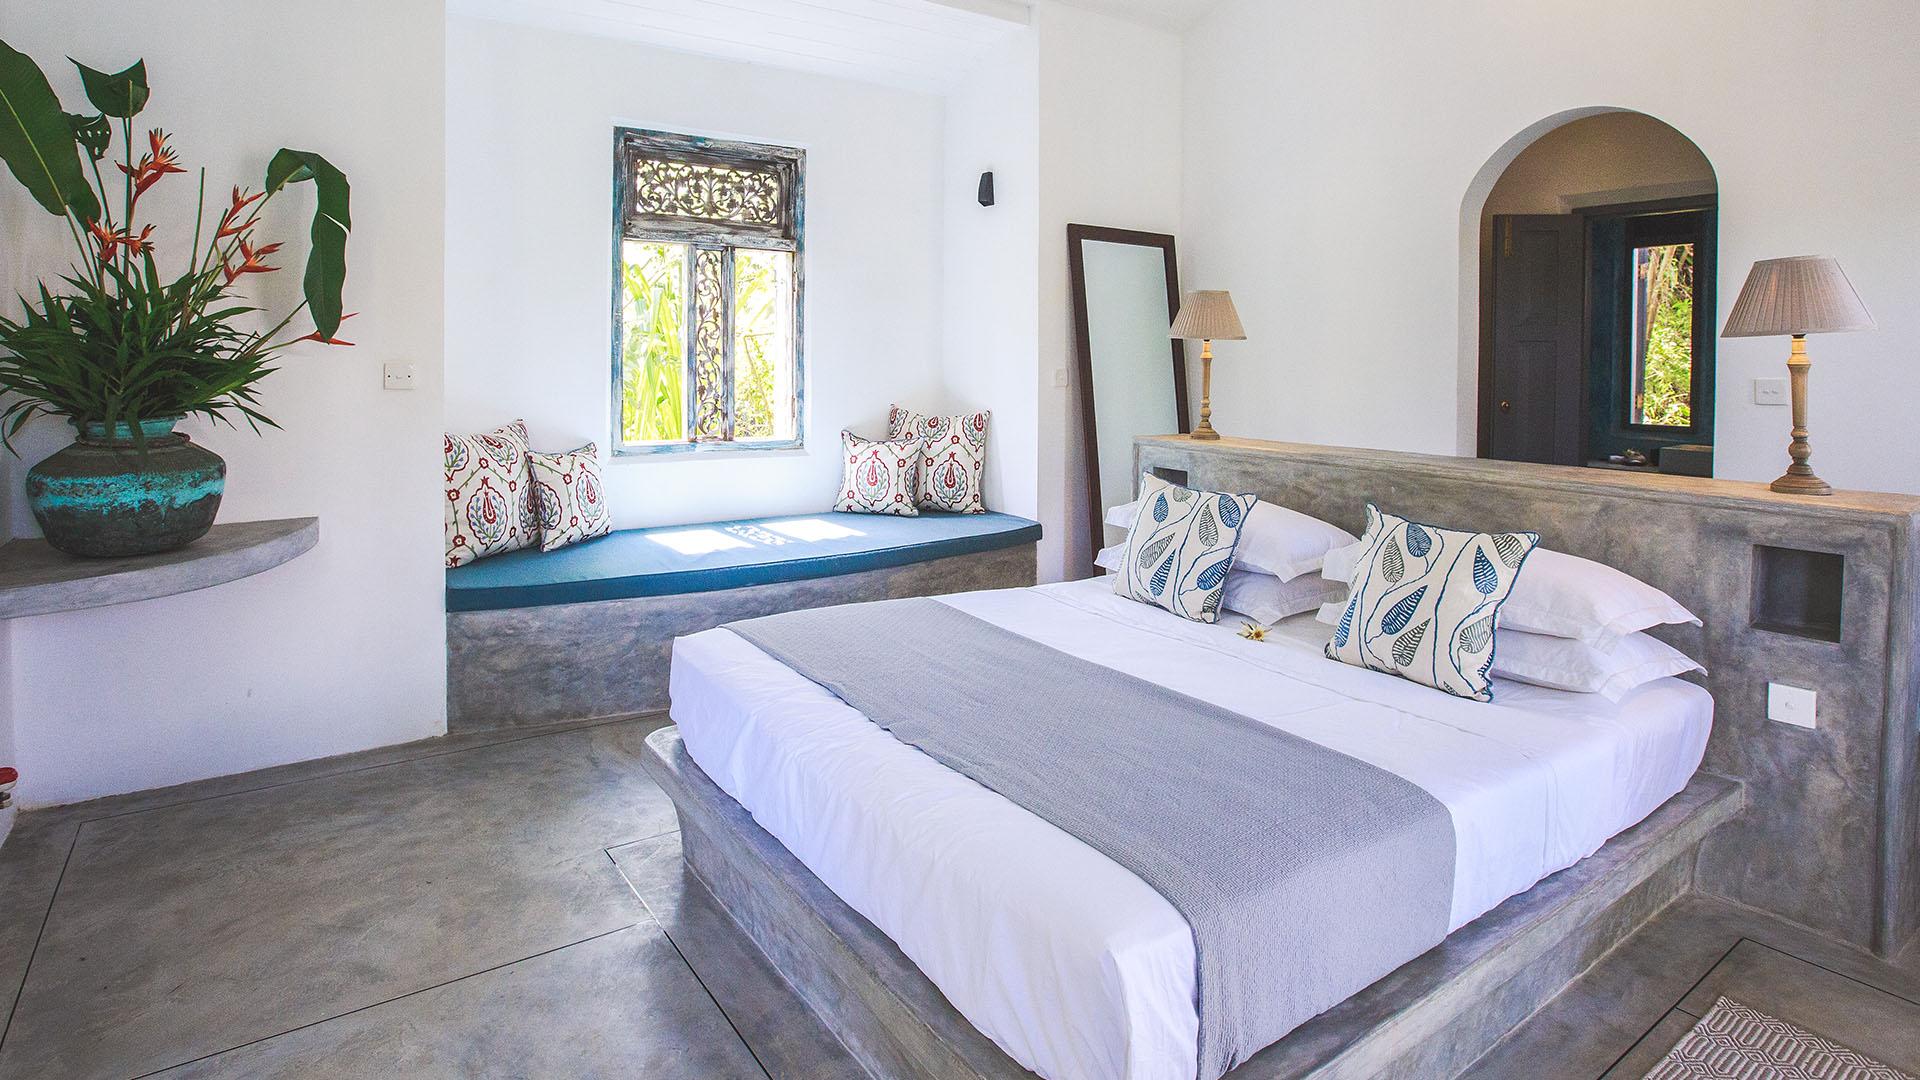 Sri_lanka_holiday_villa_sissila_river_suiteSri_lanka_holiday_villa_sissila_river_suite_01.jpg